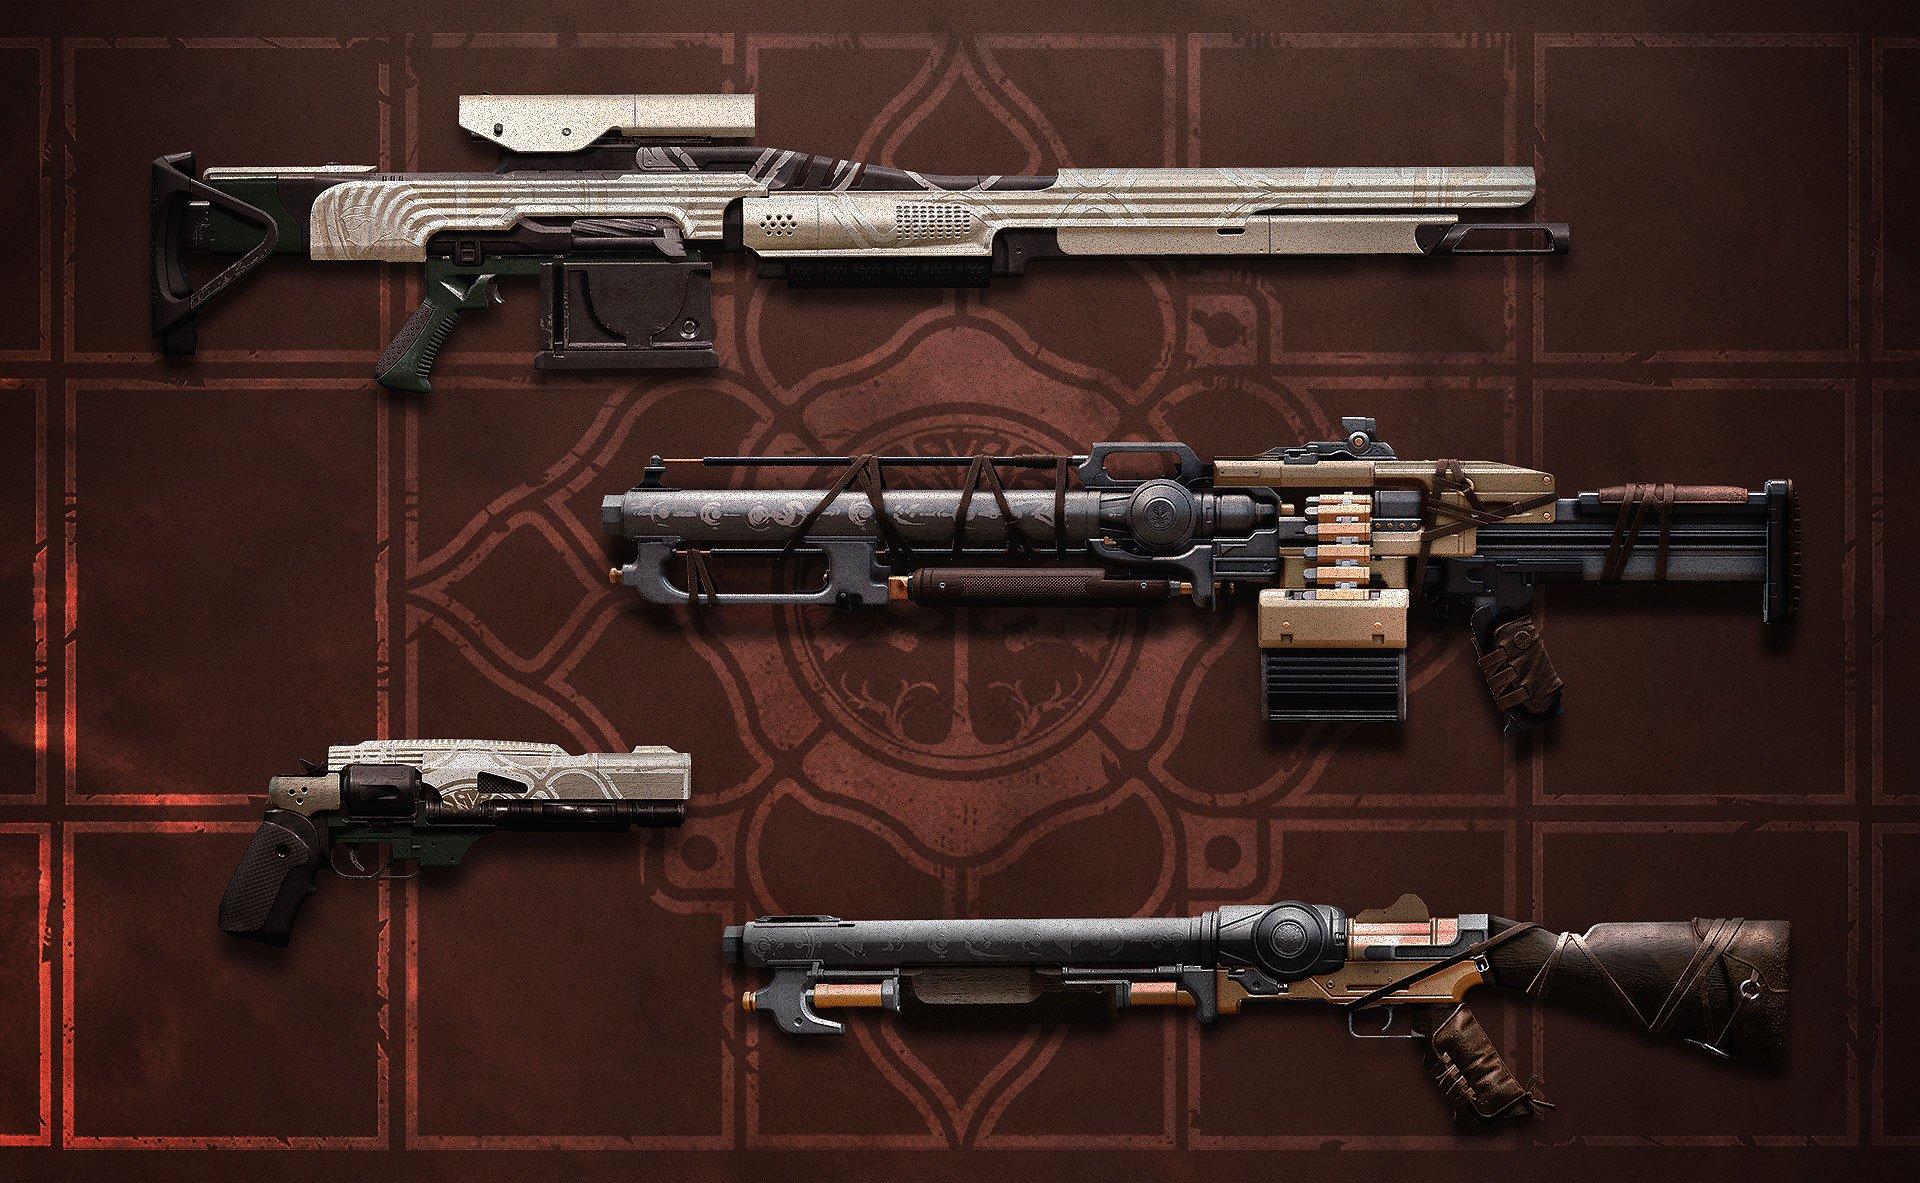 Destiny 2 Riiswalker